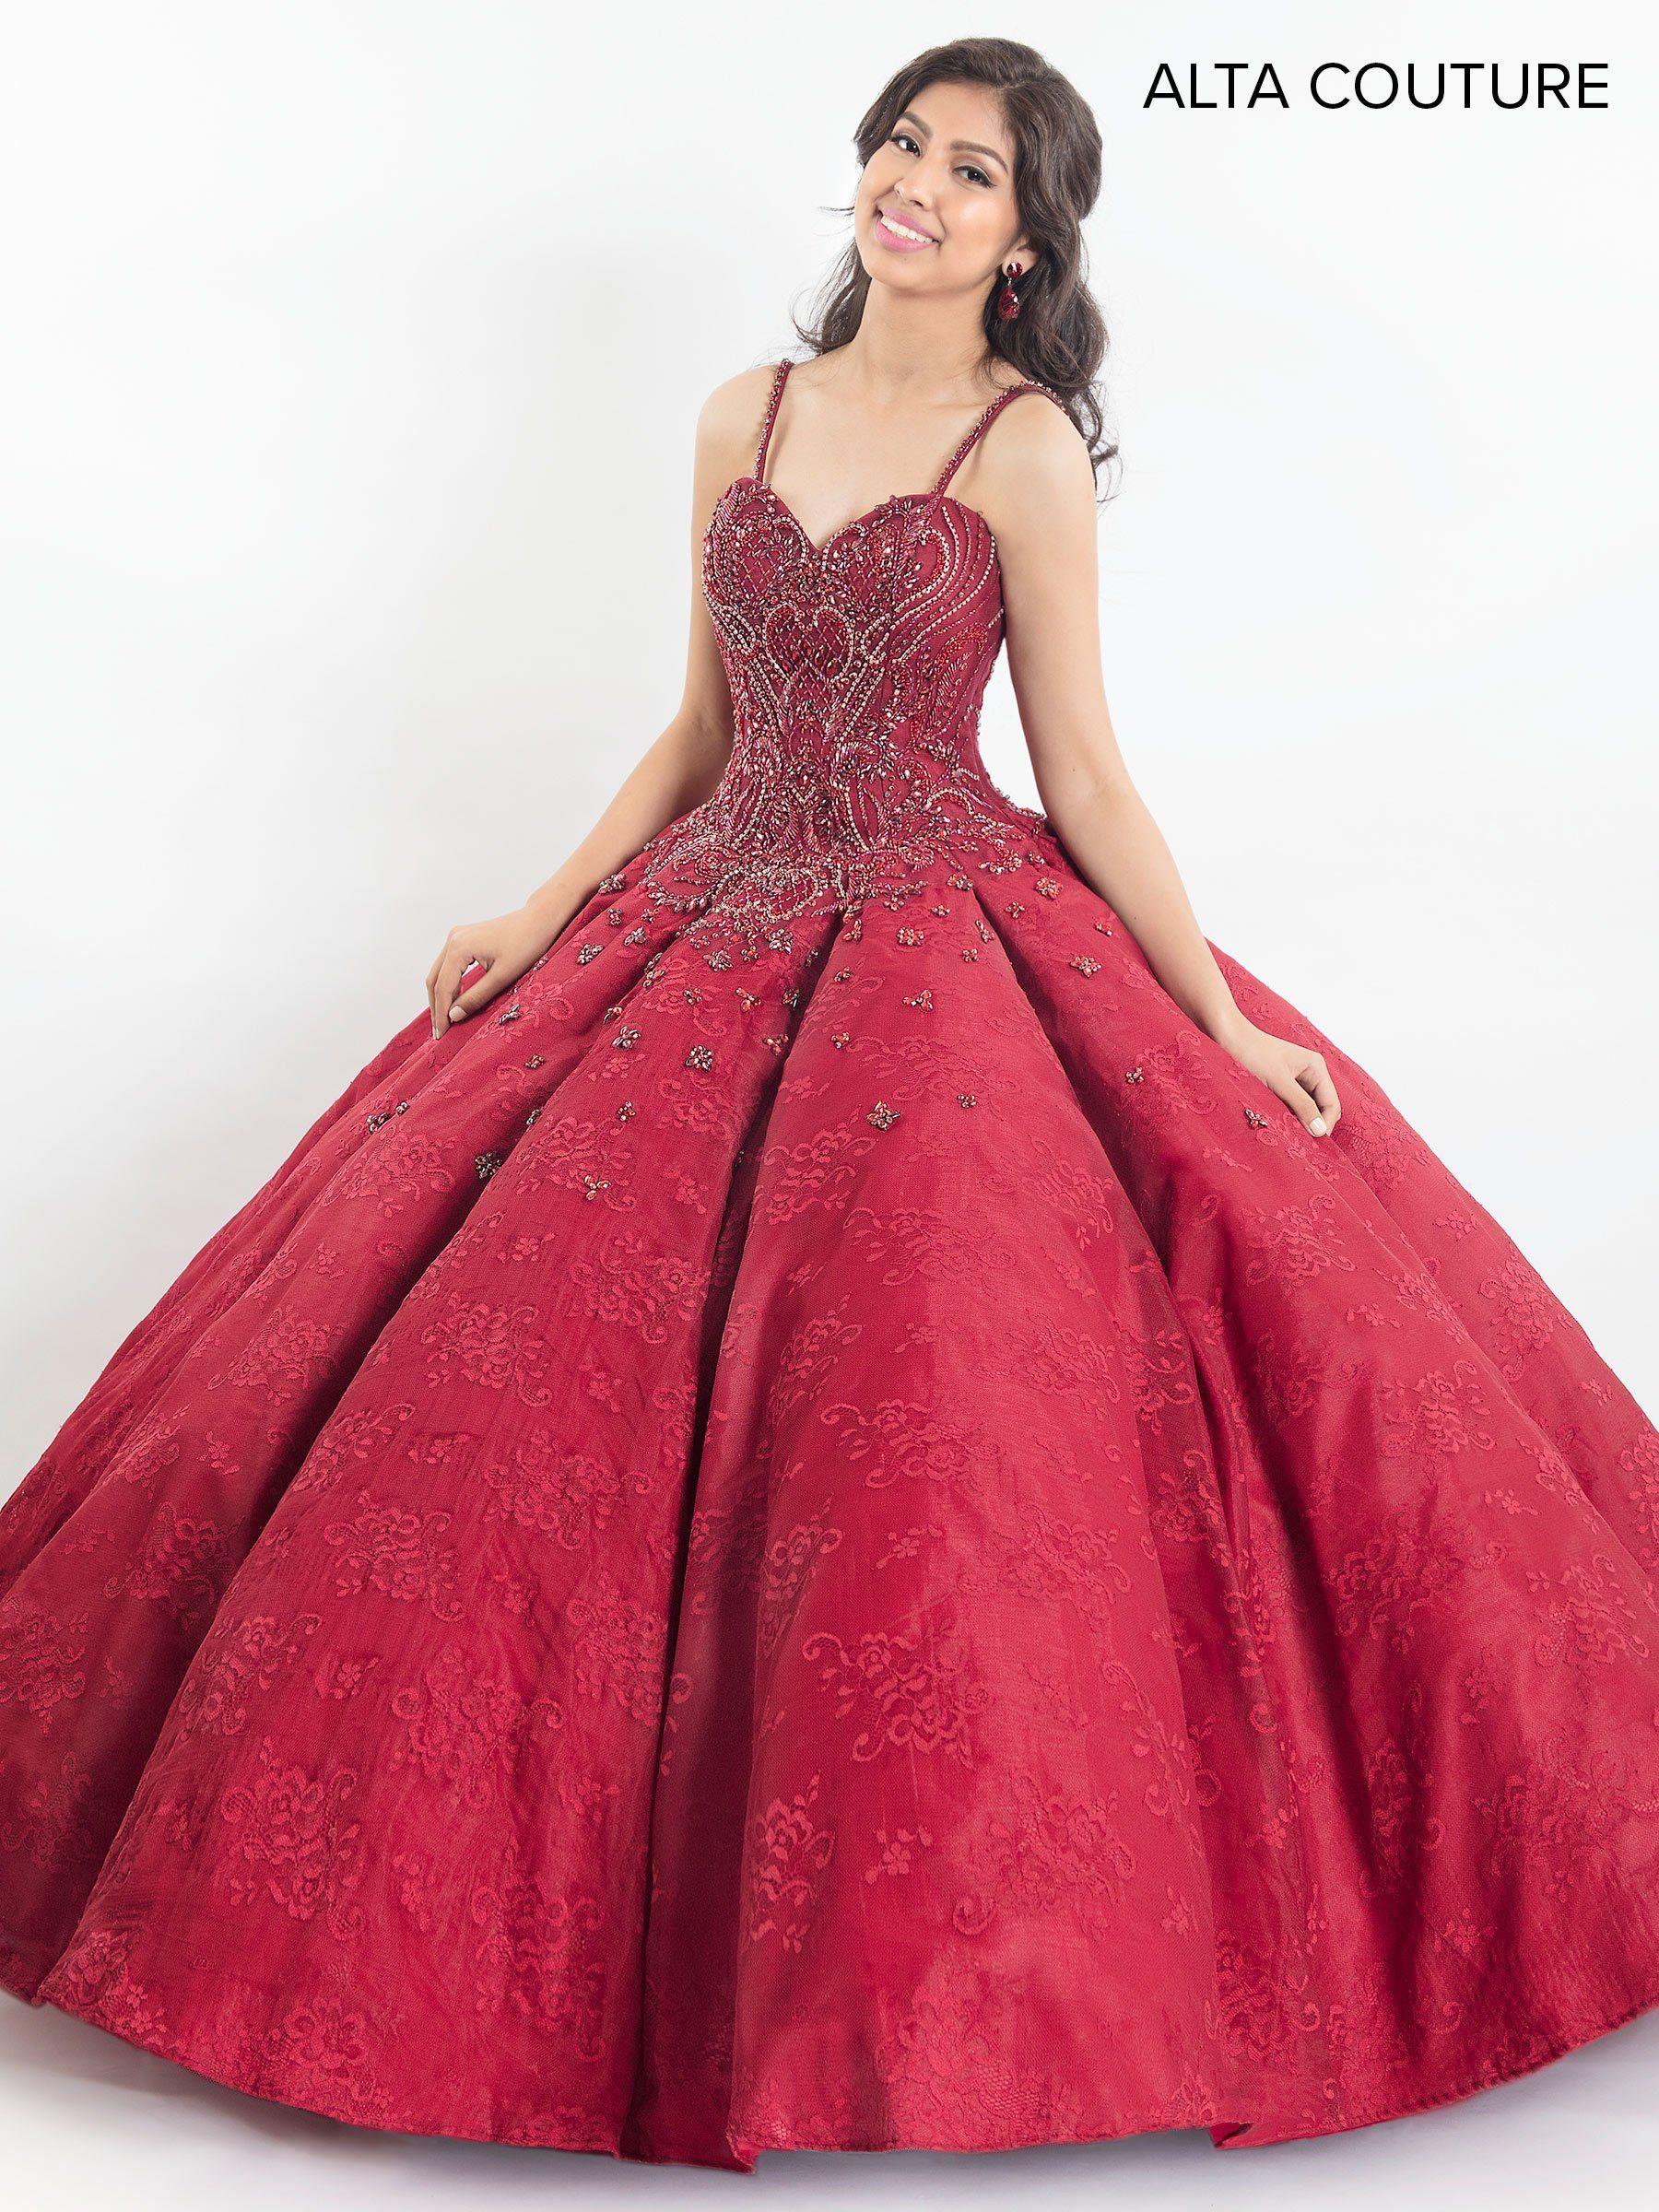 c733d8b42a Alta Couture Collection MQ3012 Marys Quinceanera - QuinceDresses.com.   elegantboutique  quince  morileedress  quincestyle  dresses  centraljersey   fashion ...